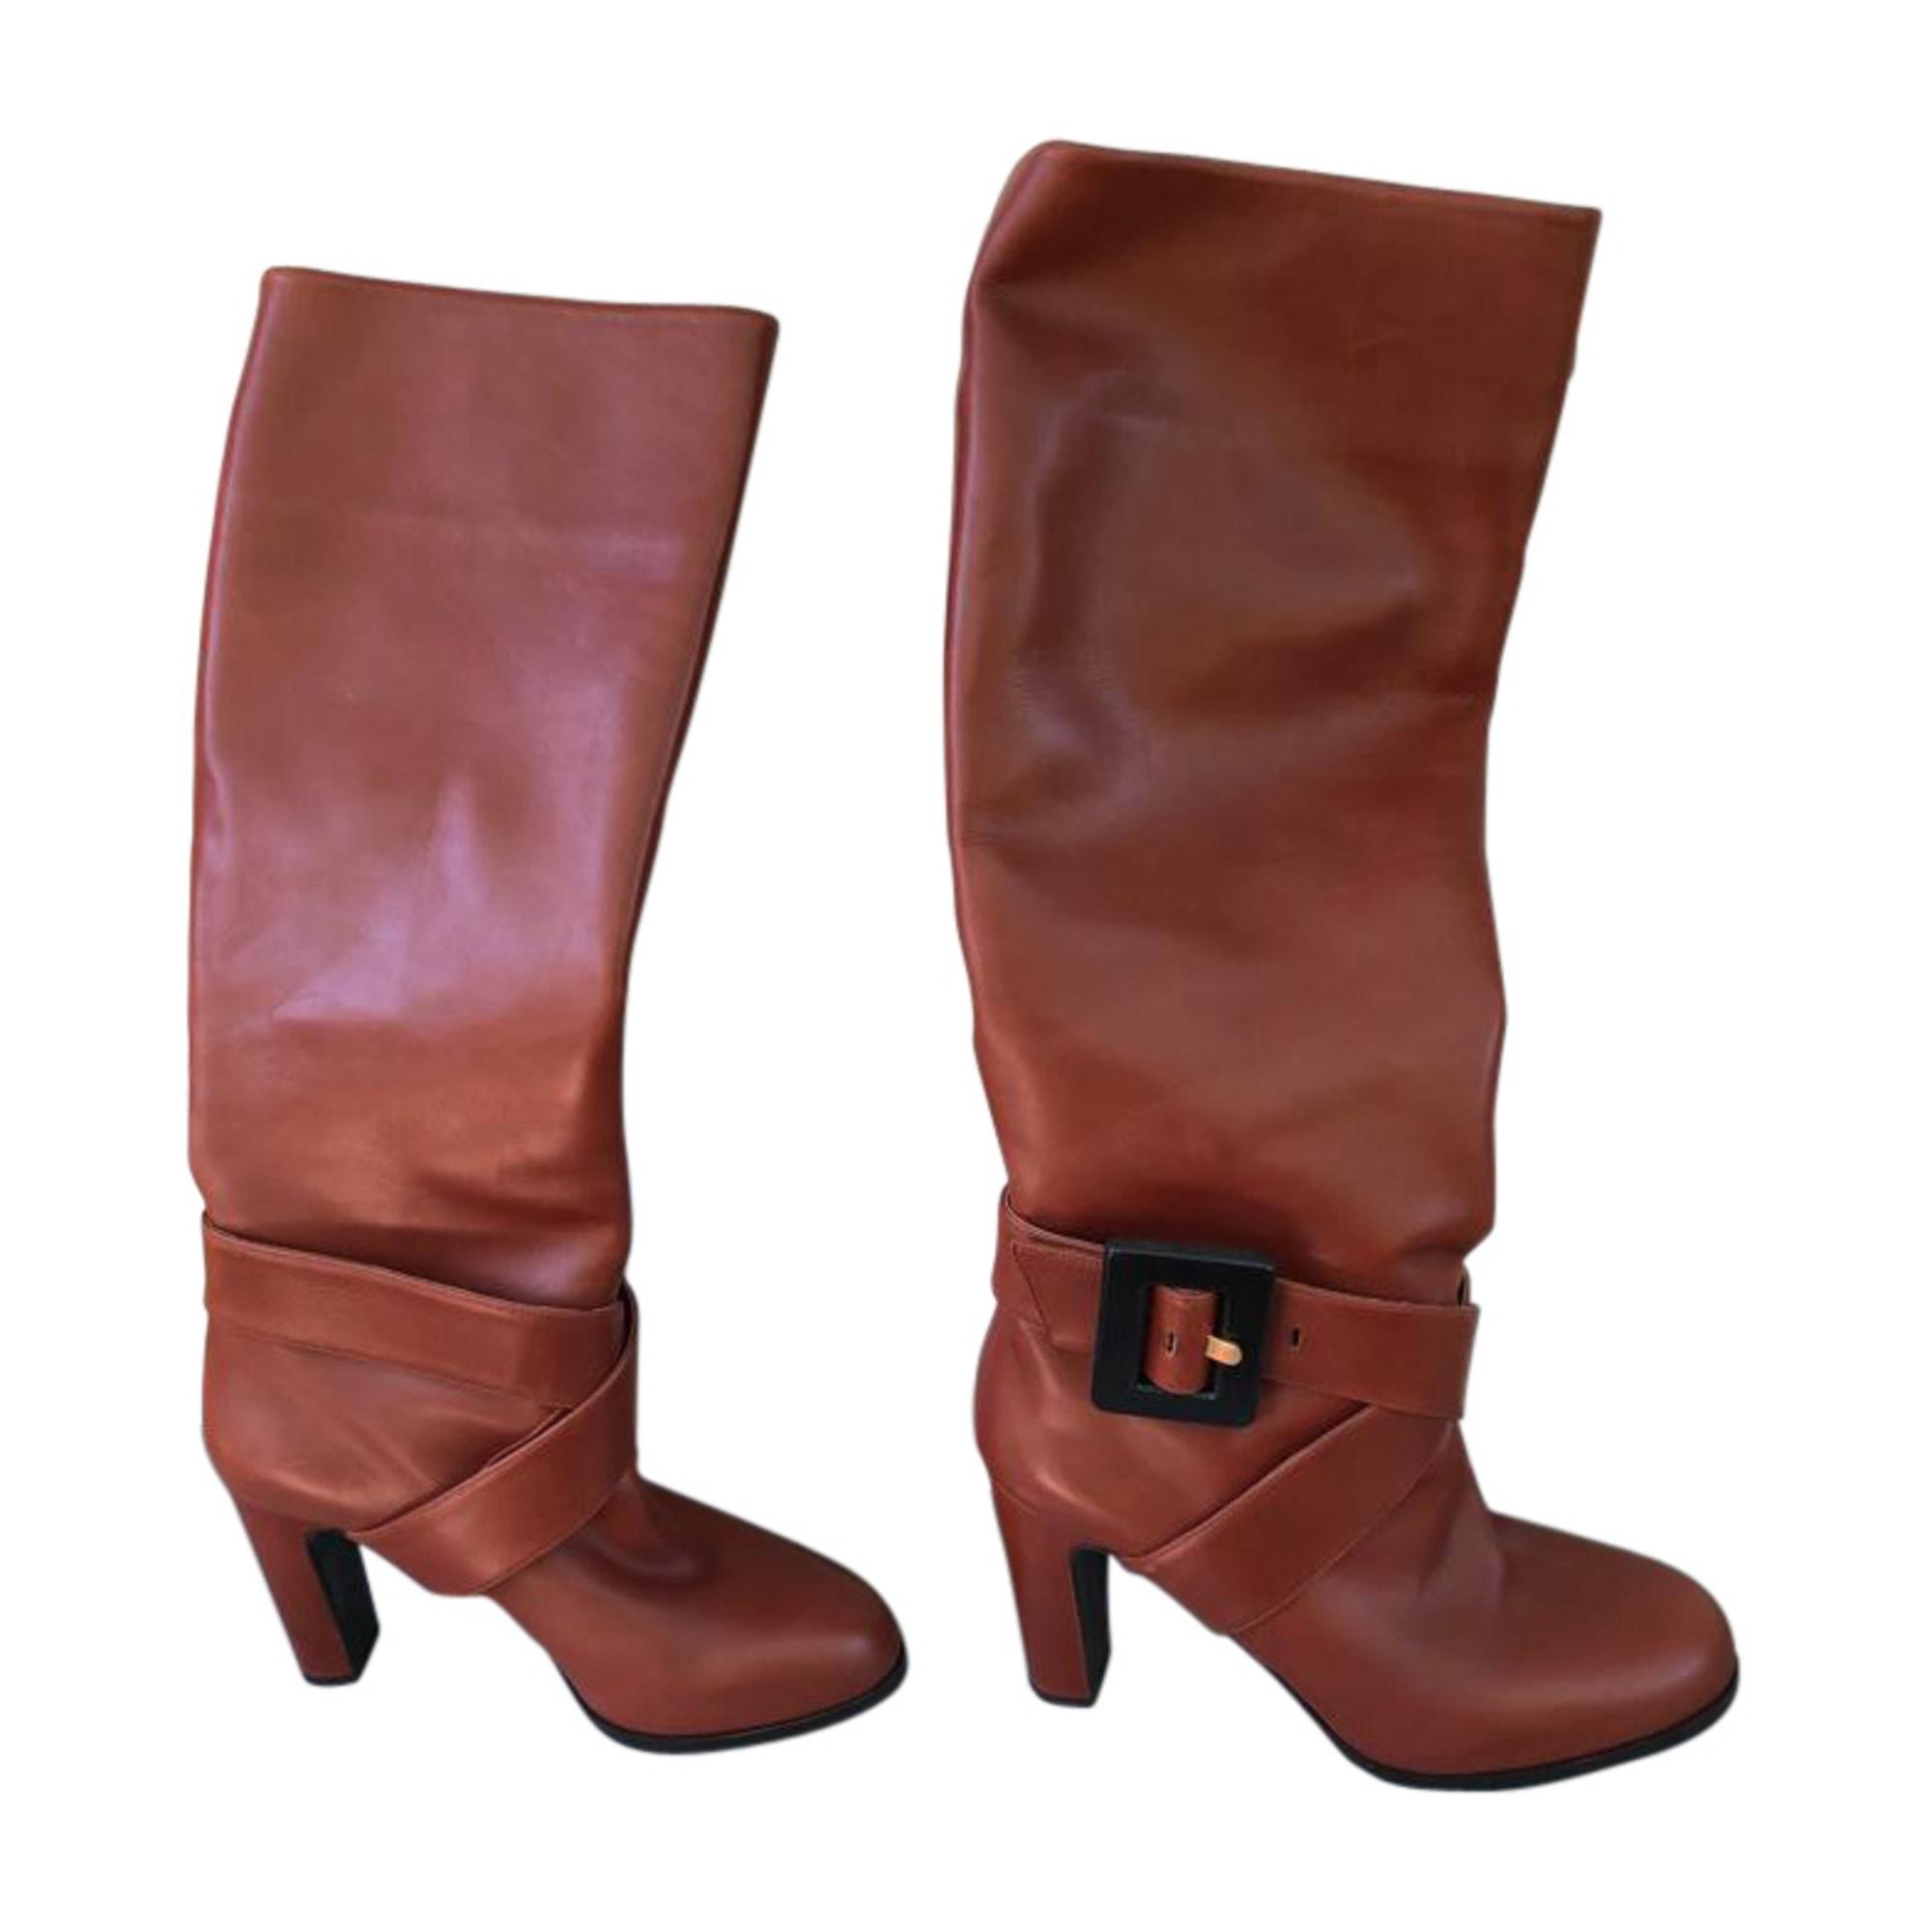 High Heel Boots HERMÈS Brown